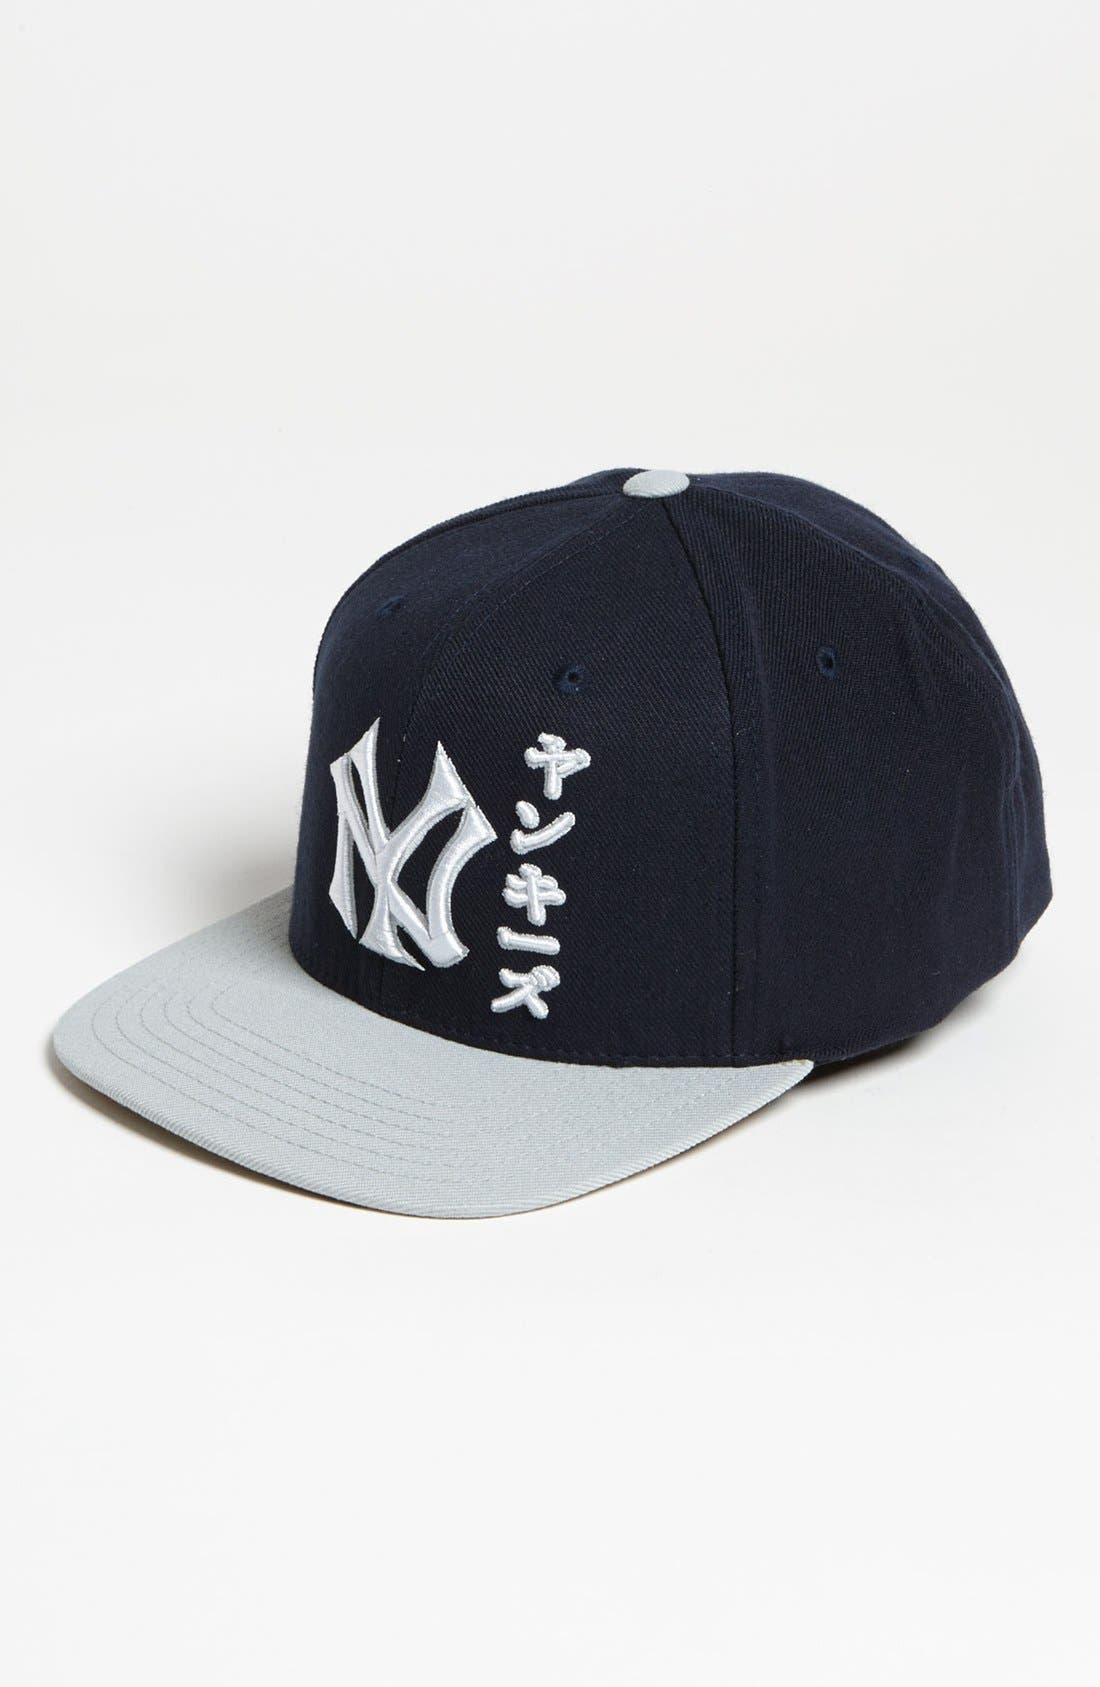 Main Image - American Needle 'Tokyo Pop - New York Yankees' Snapback Baseball Cap